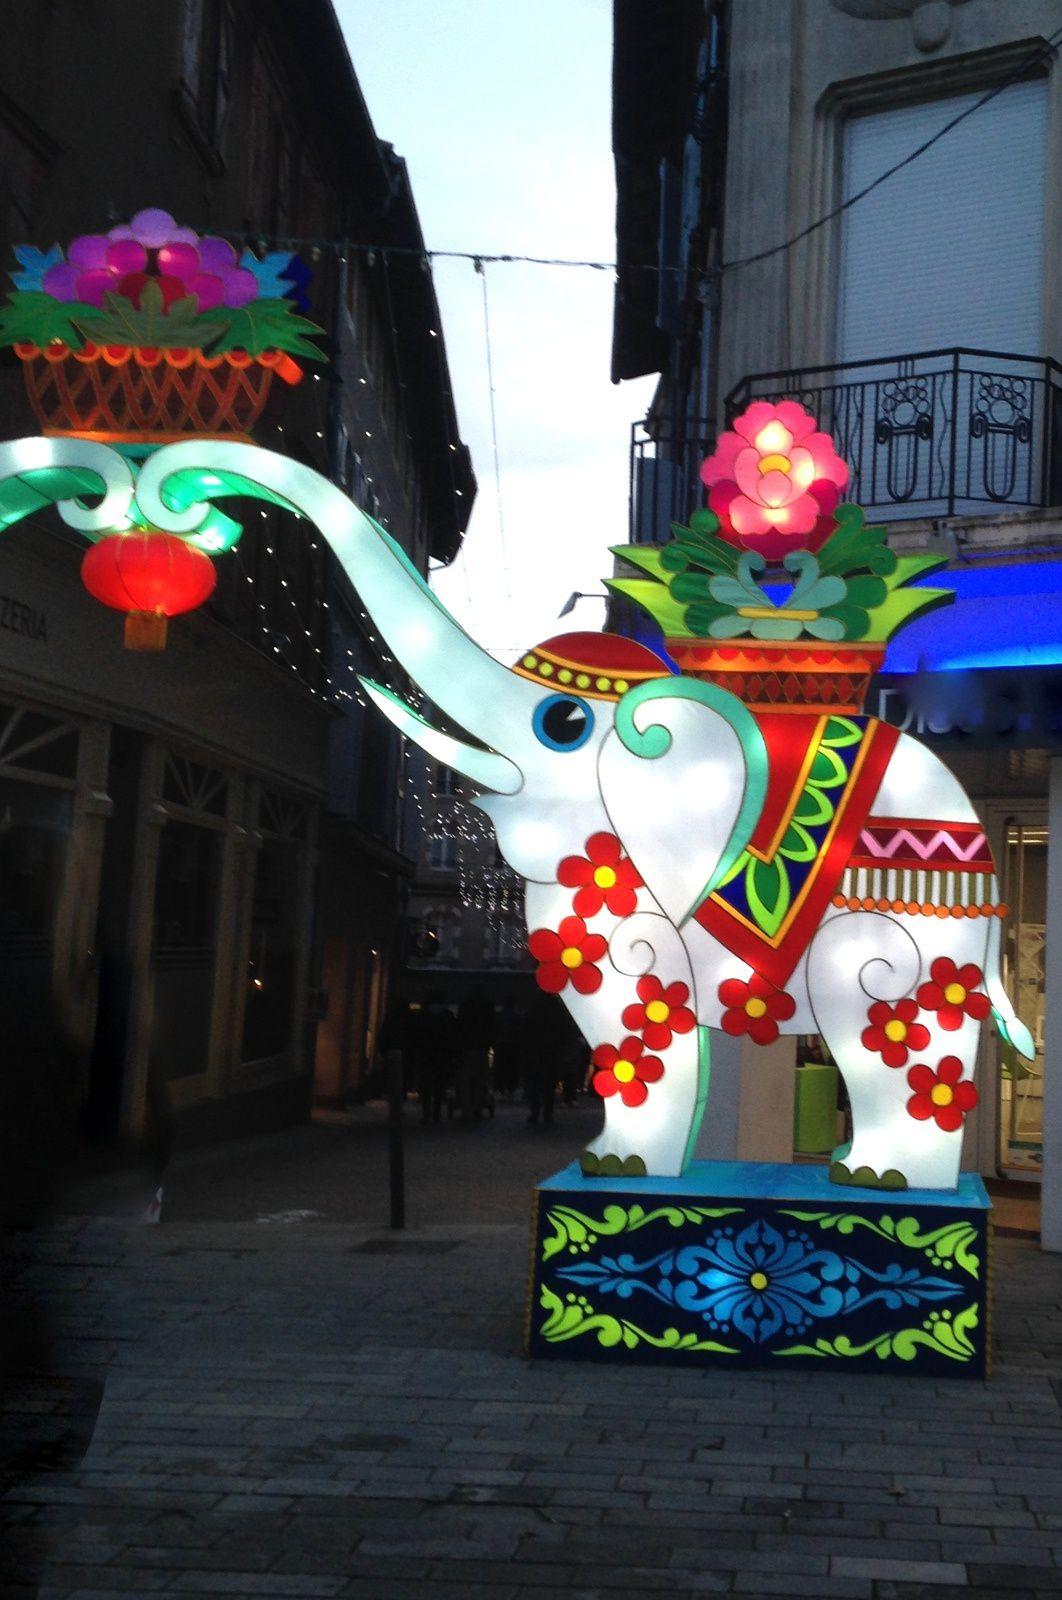 #lanternes  chinoises #gaillac #feeries #charlotteblabla blog